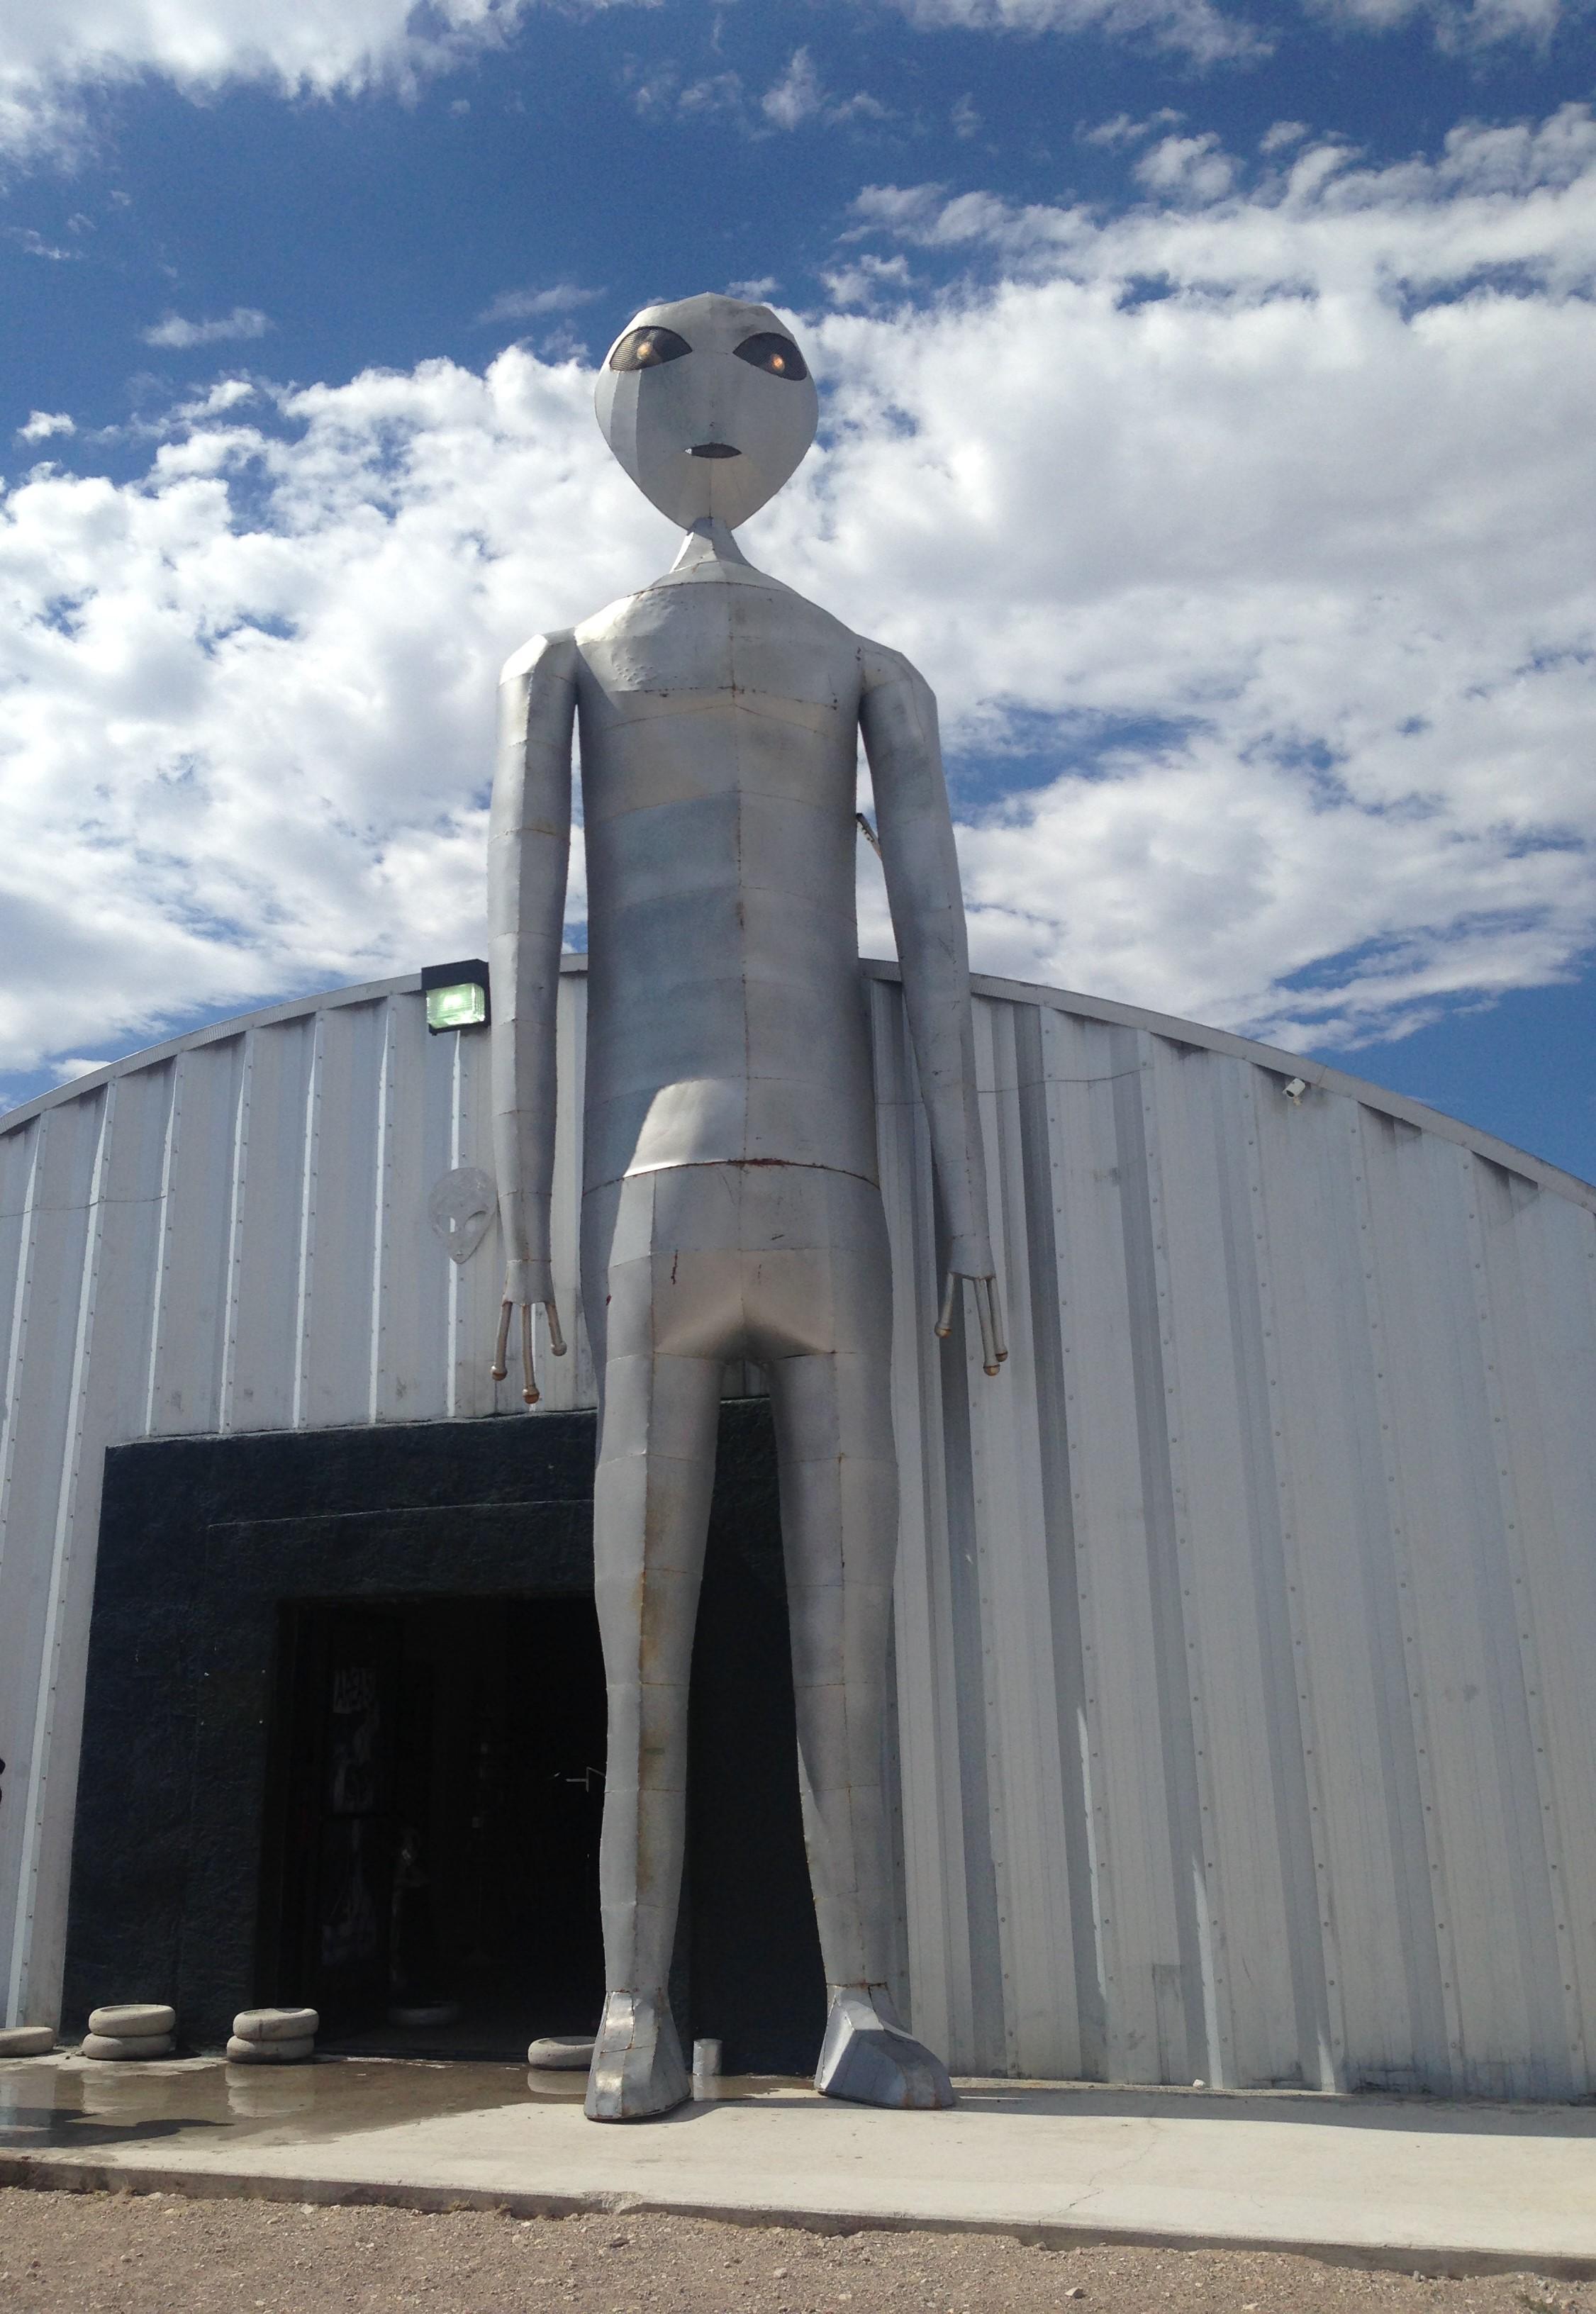 alien research center